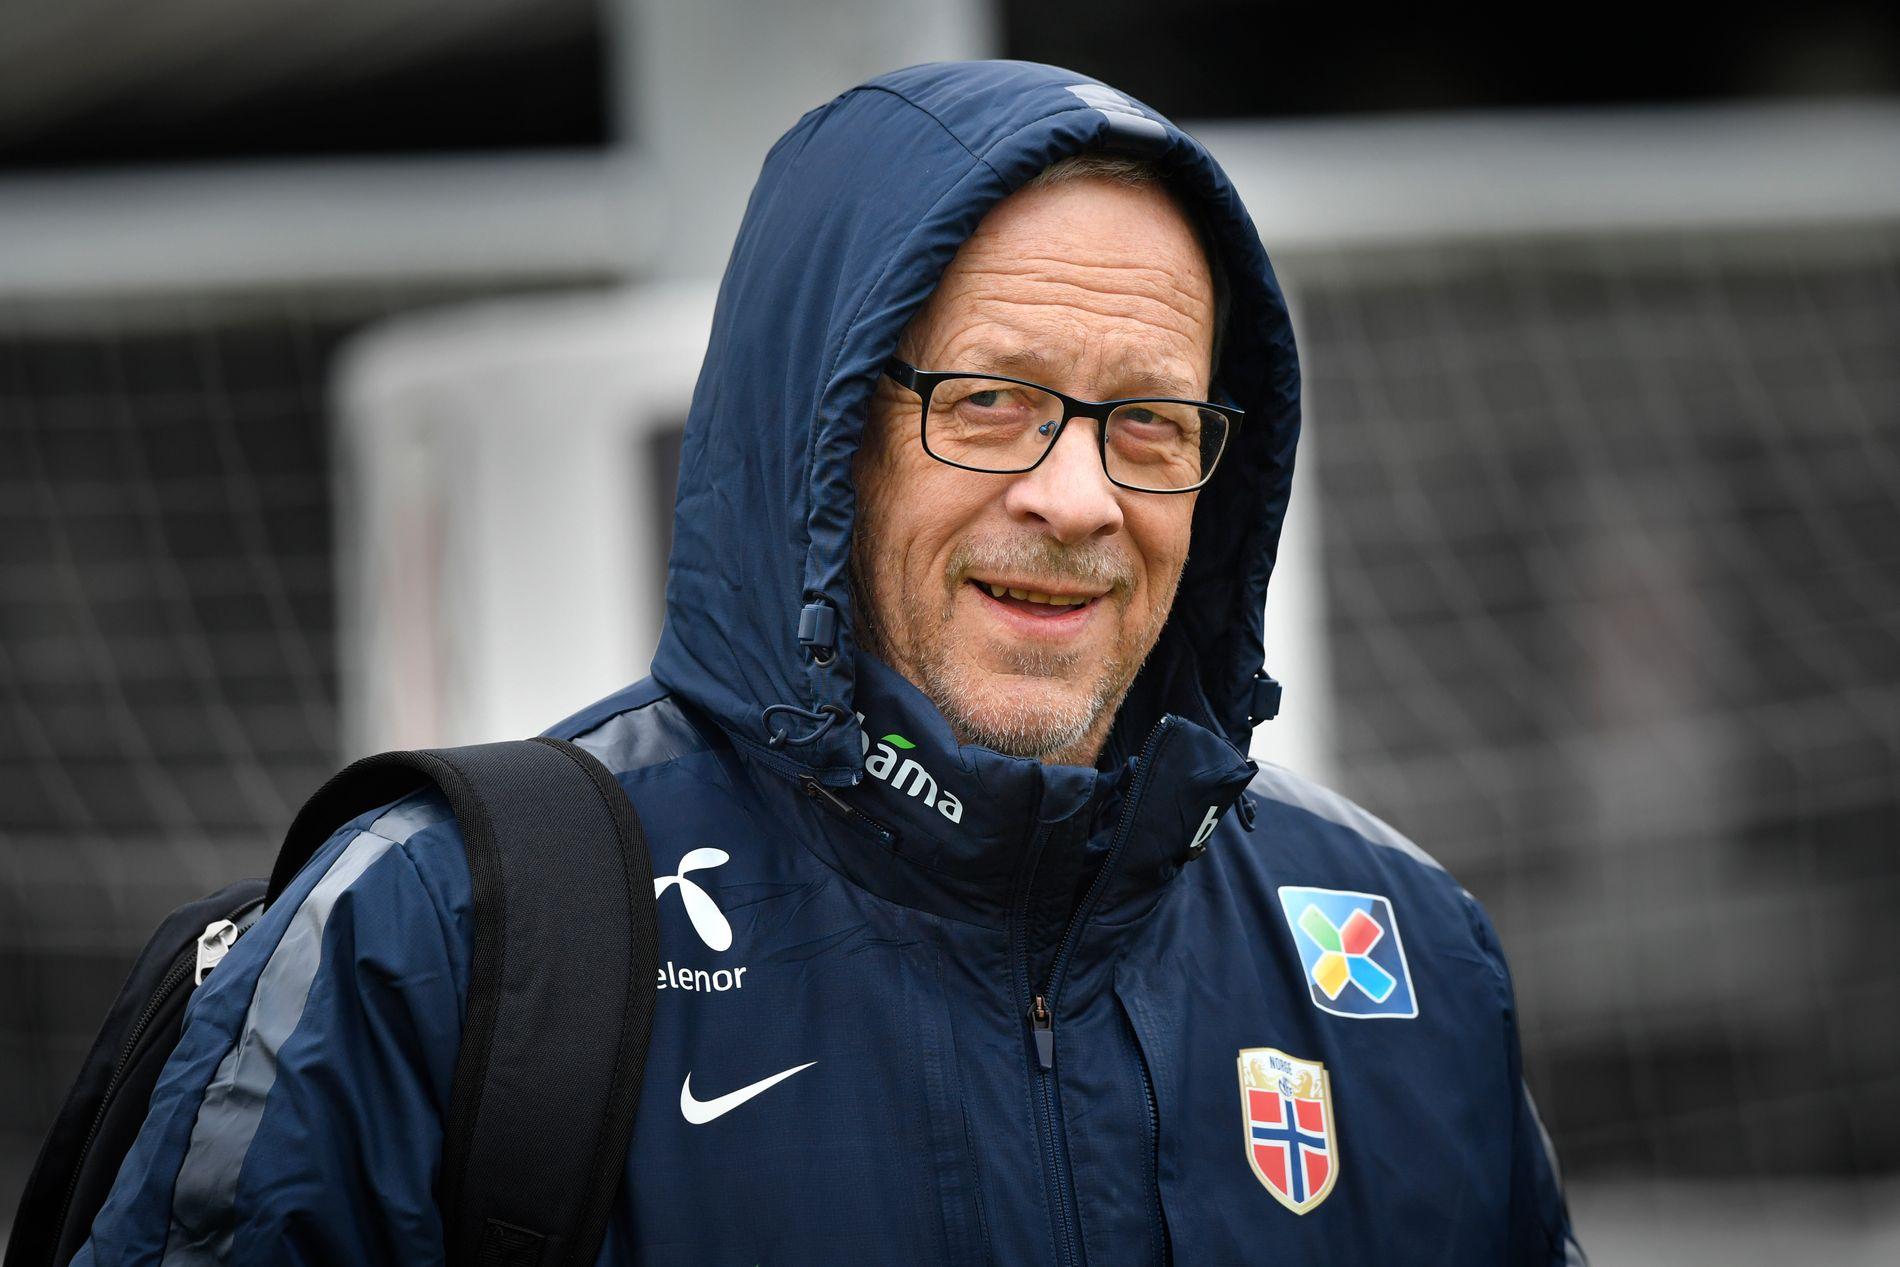 LATTERMILD: Lars Lagerbäck var i godt humør da han sa at Norge ikke er i stand til å spille som Manchester City.